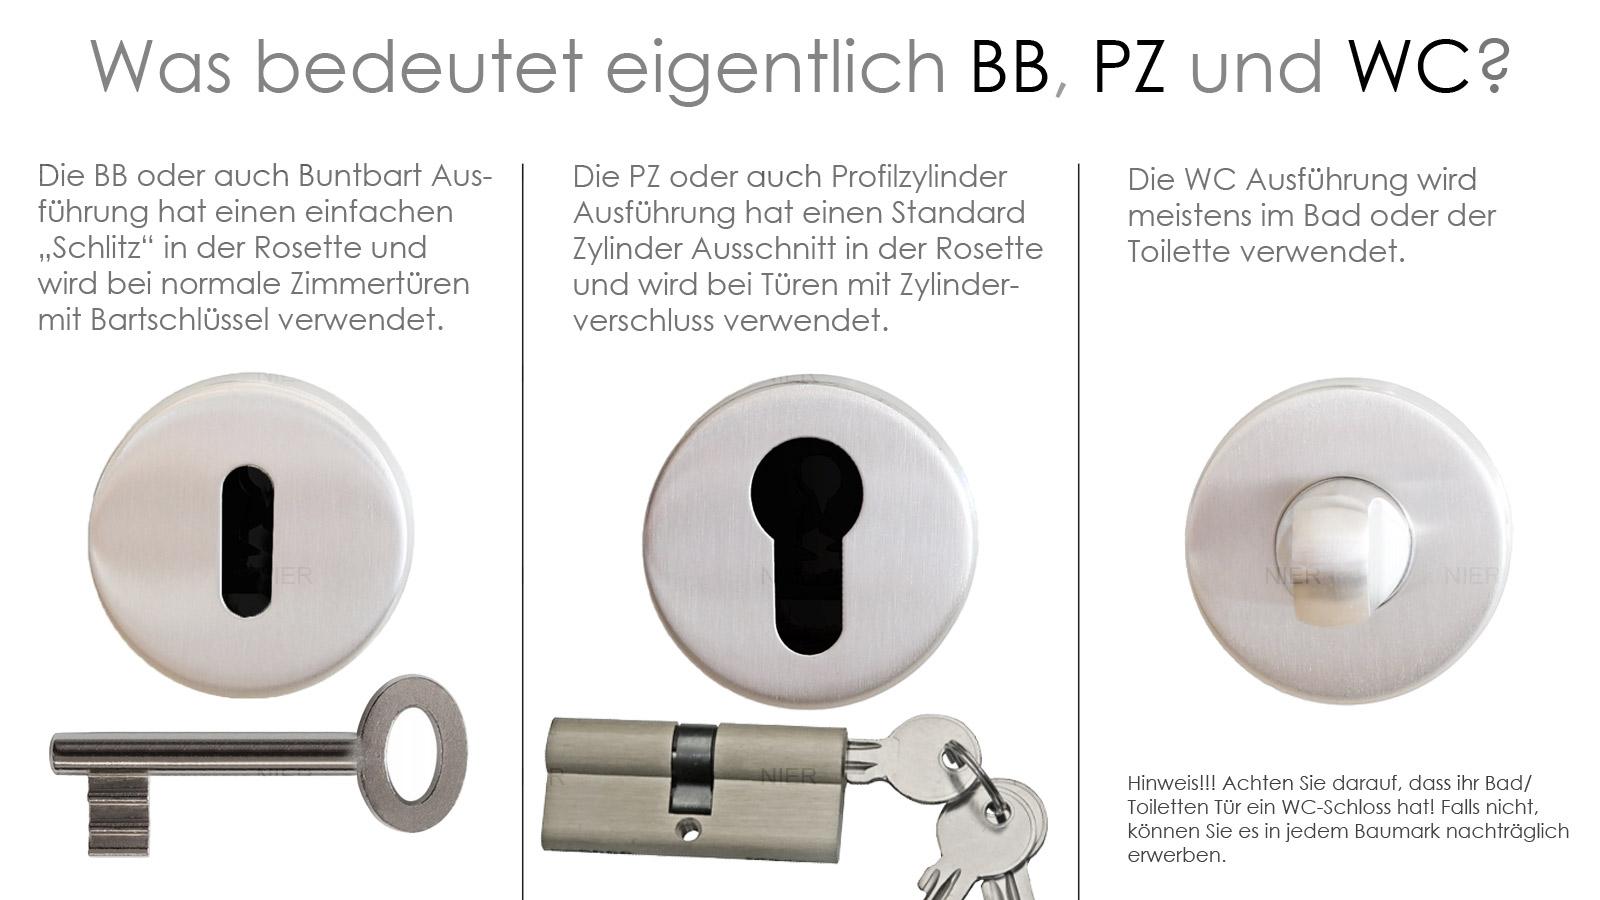 Türgriff Edelstahl Türbeschlag Drückergarnitur Türklinke BB PZ WC Design Uranus